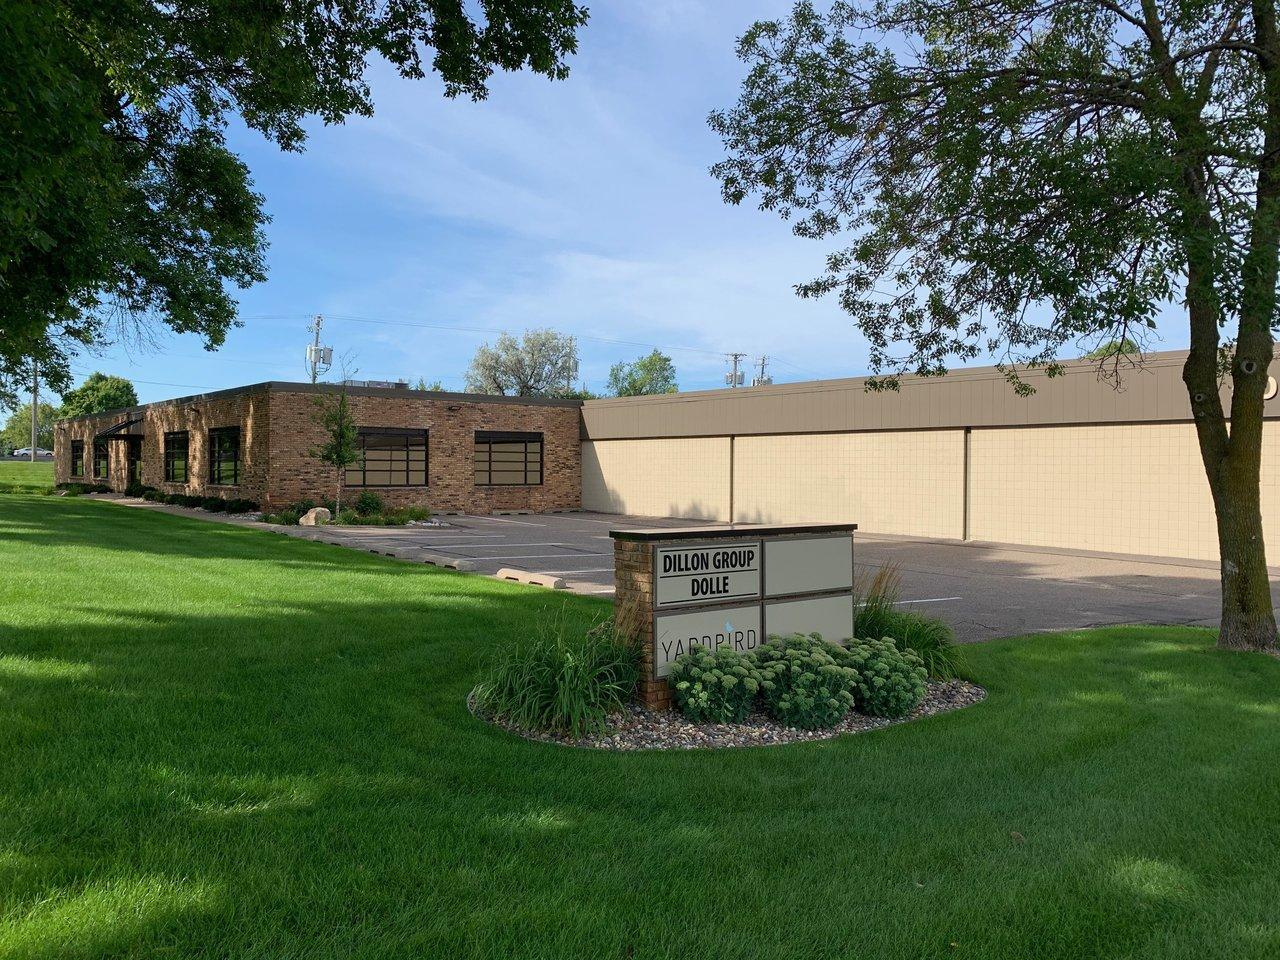 5017 Boone Ave N, New Hope, MN, 55428